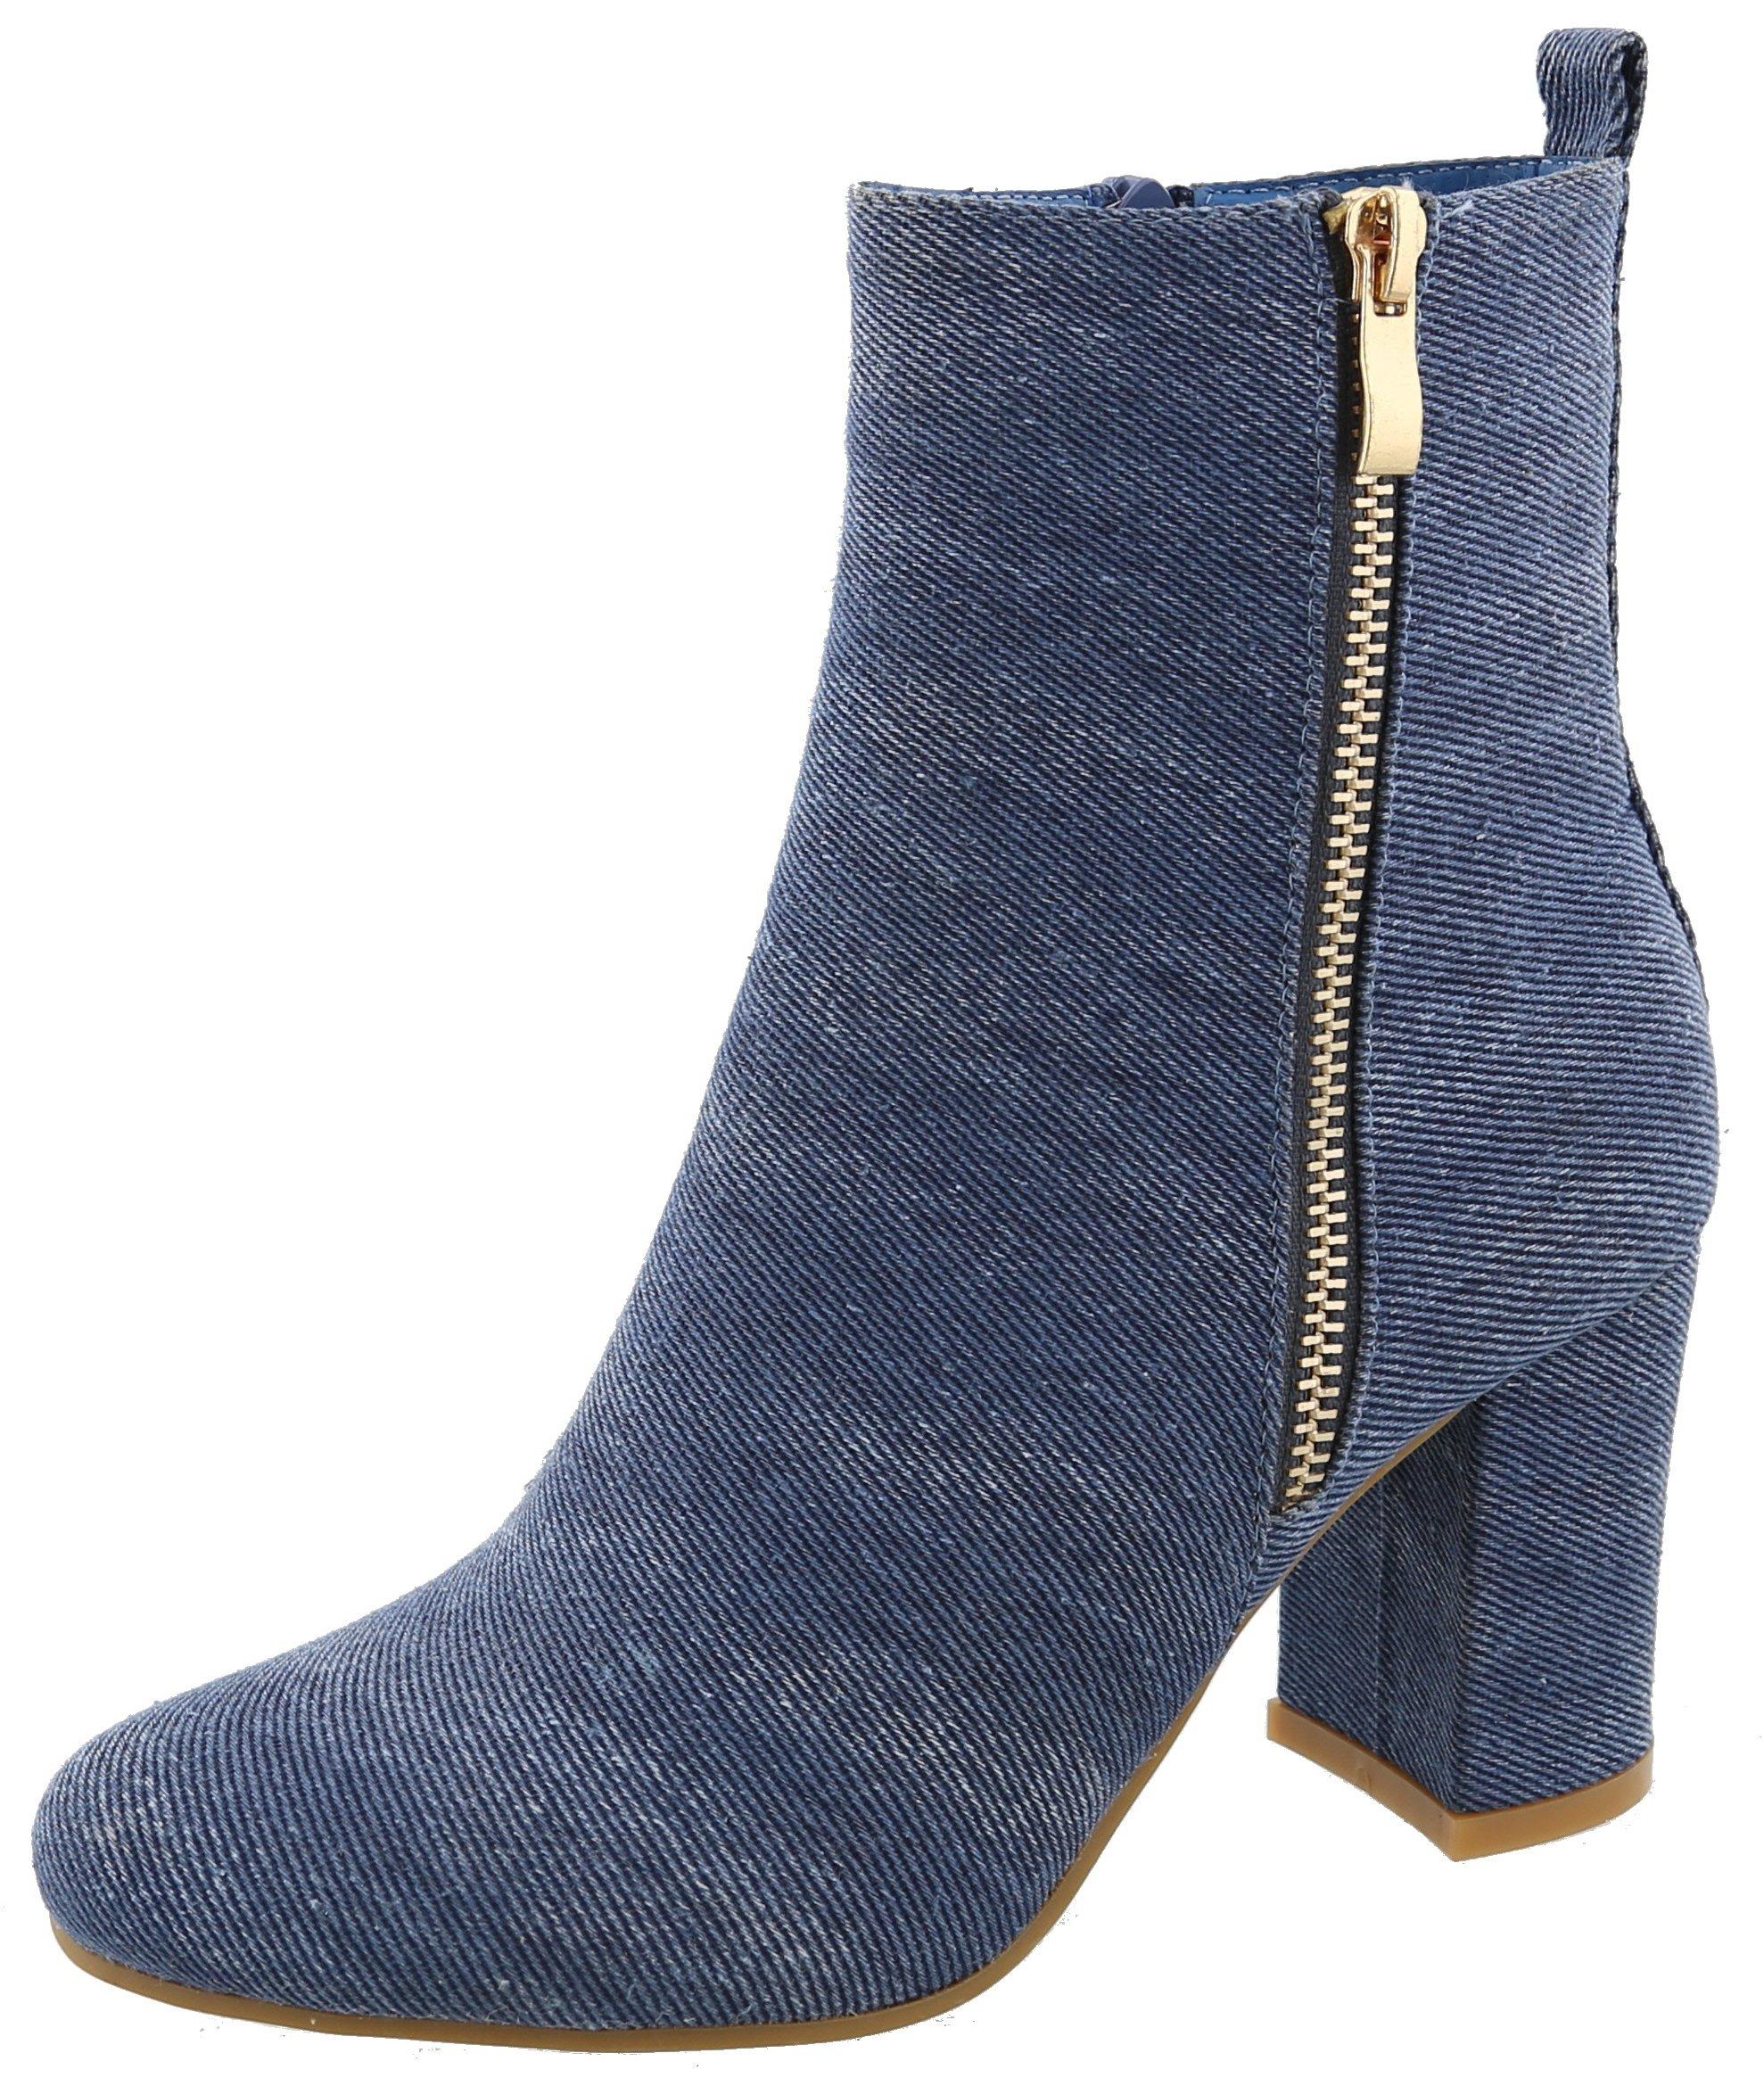 Top Moda Women's Exposed Zipper Block Heel Round Toe Ankle Bootie (8.5 B(M) US, Blue Denim)